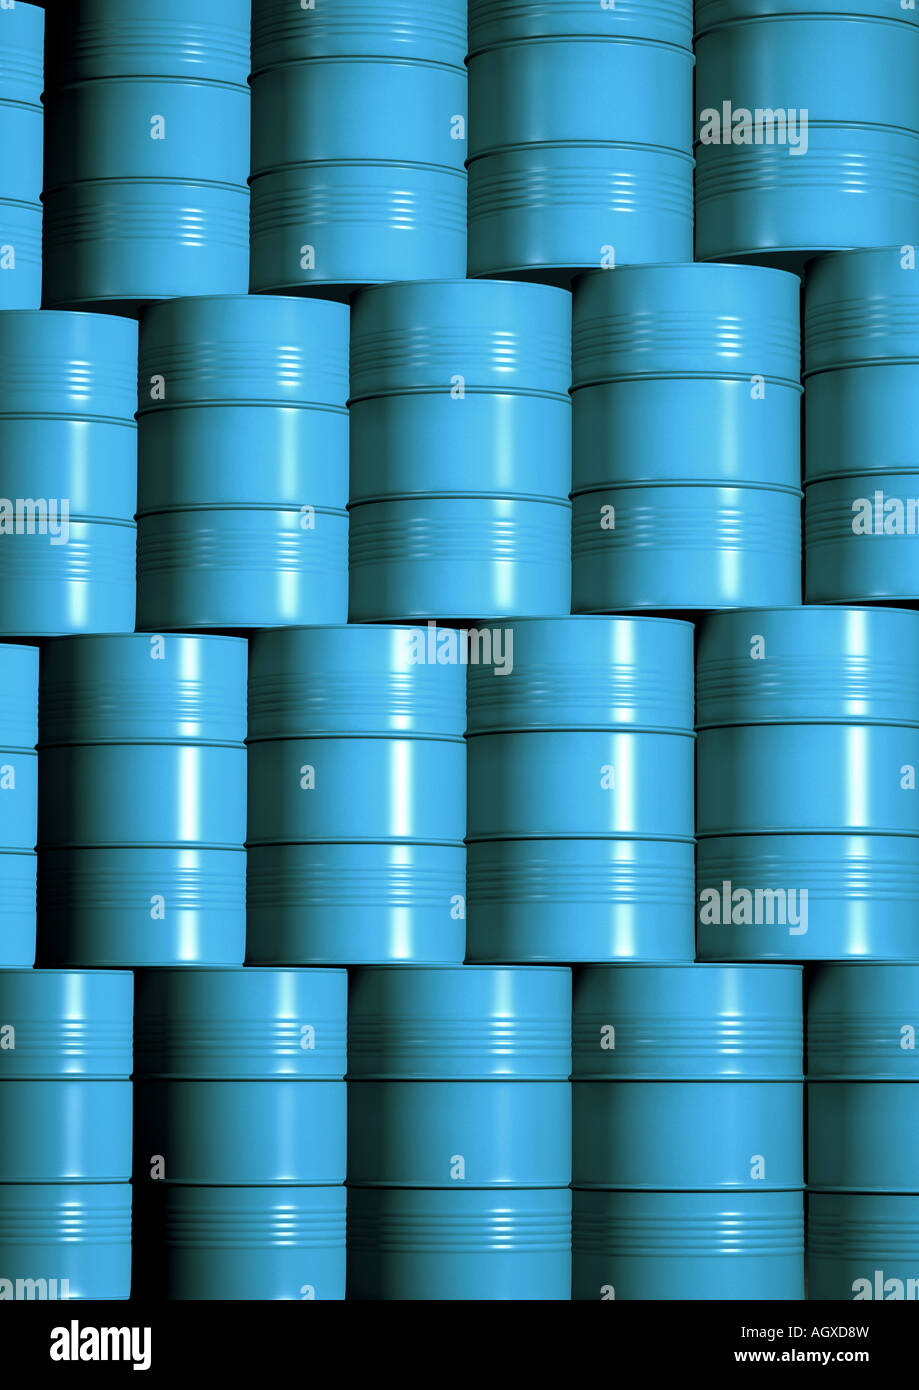 drum storage gestapelte Faesser Chemielager - Stock Image